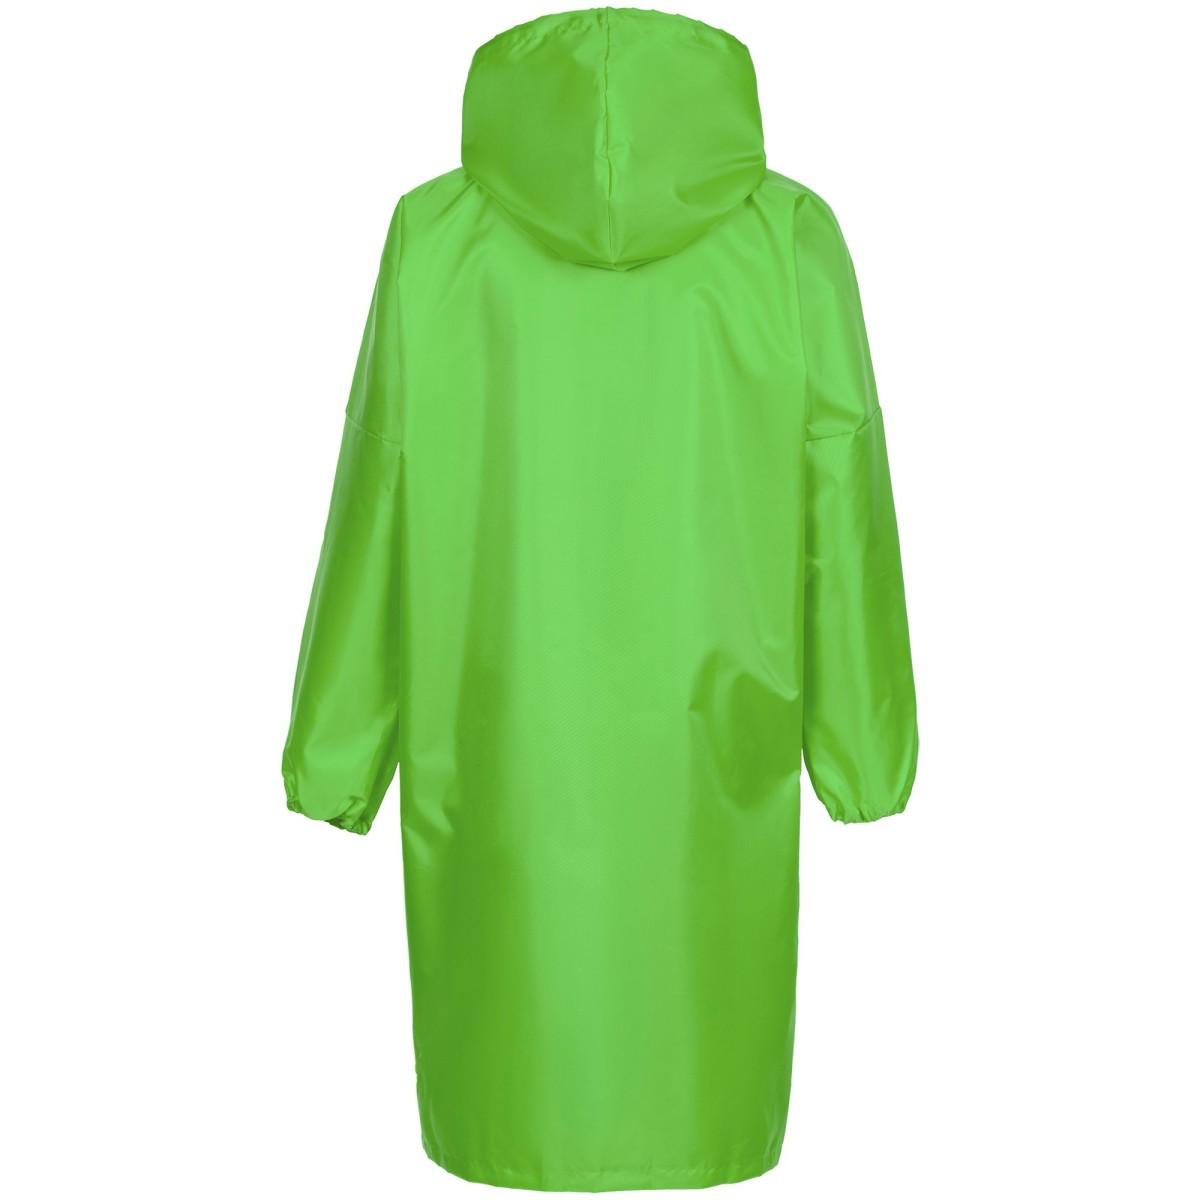 Дождевик Rainman Strong Зеленый Xs